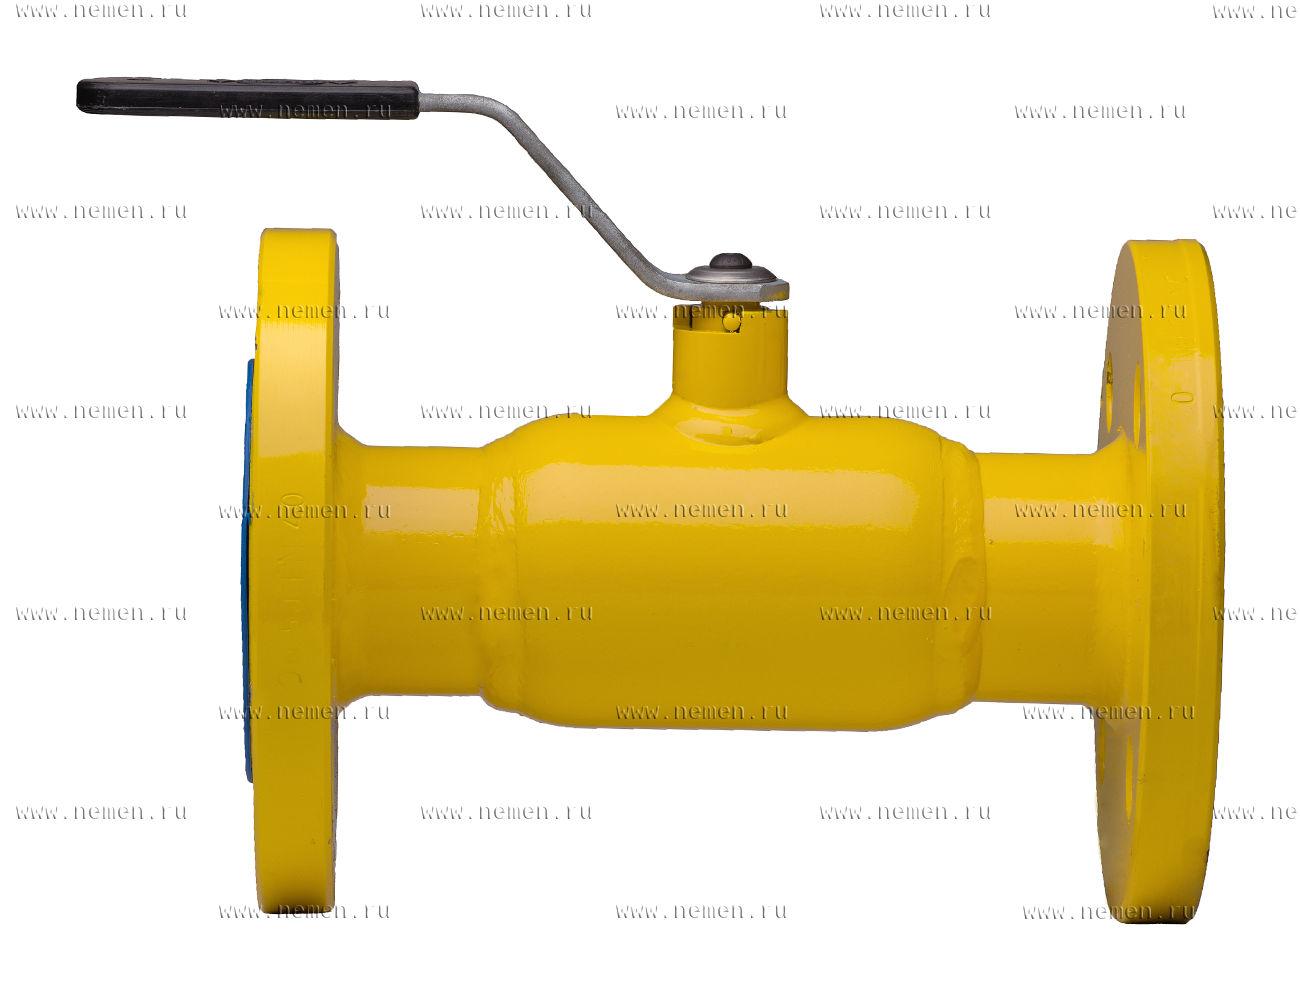 Кран шаровой КШ-200ф